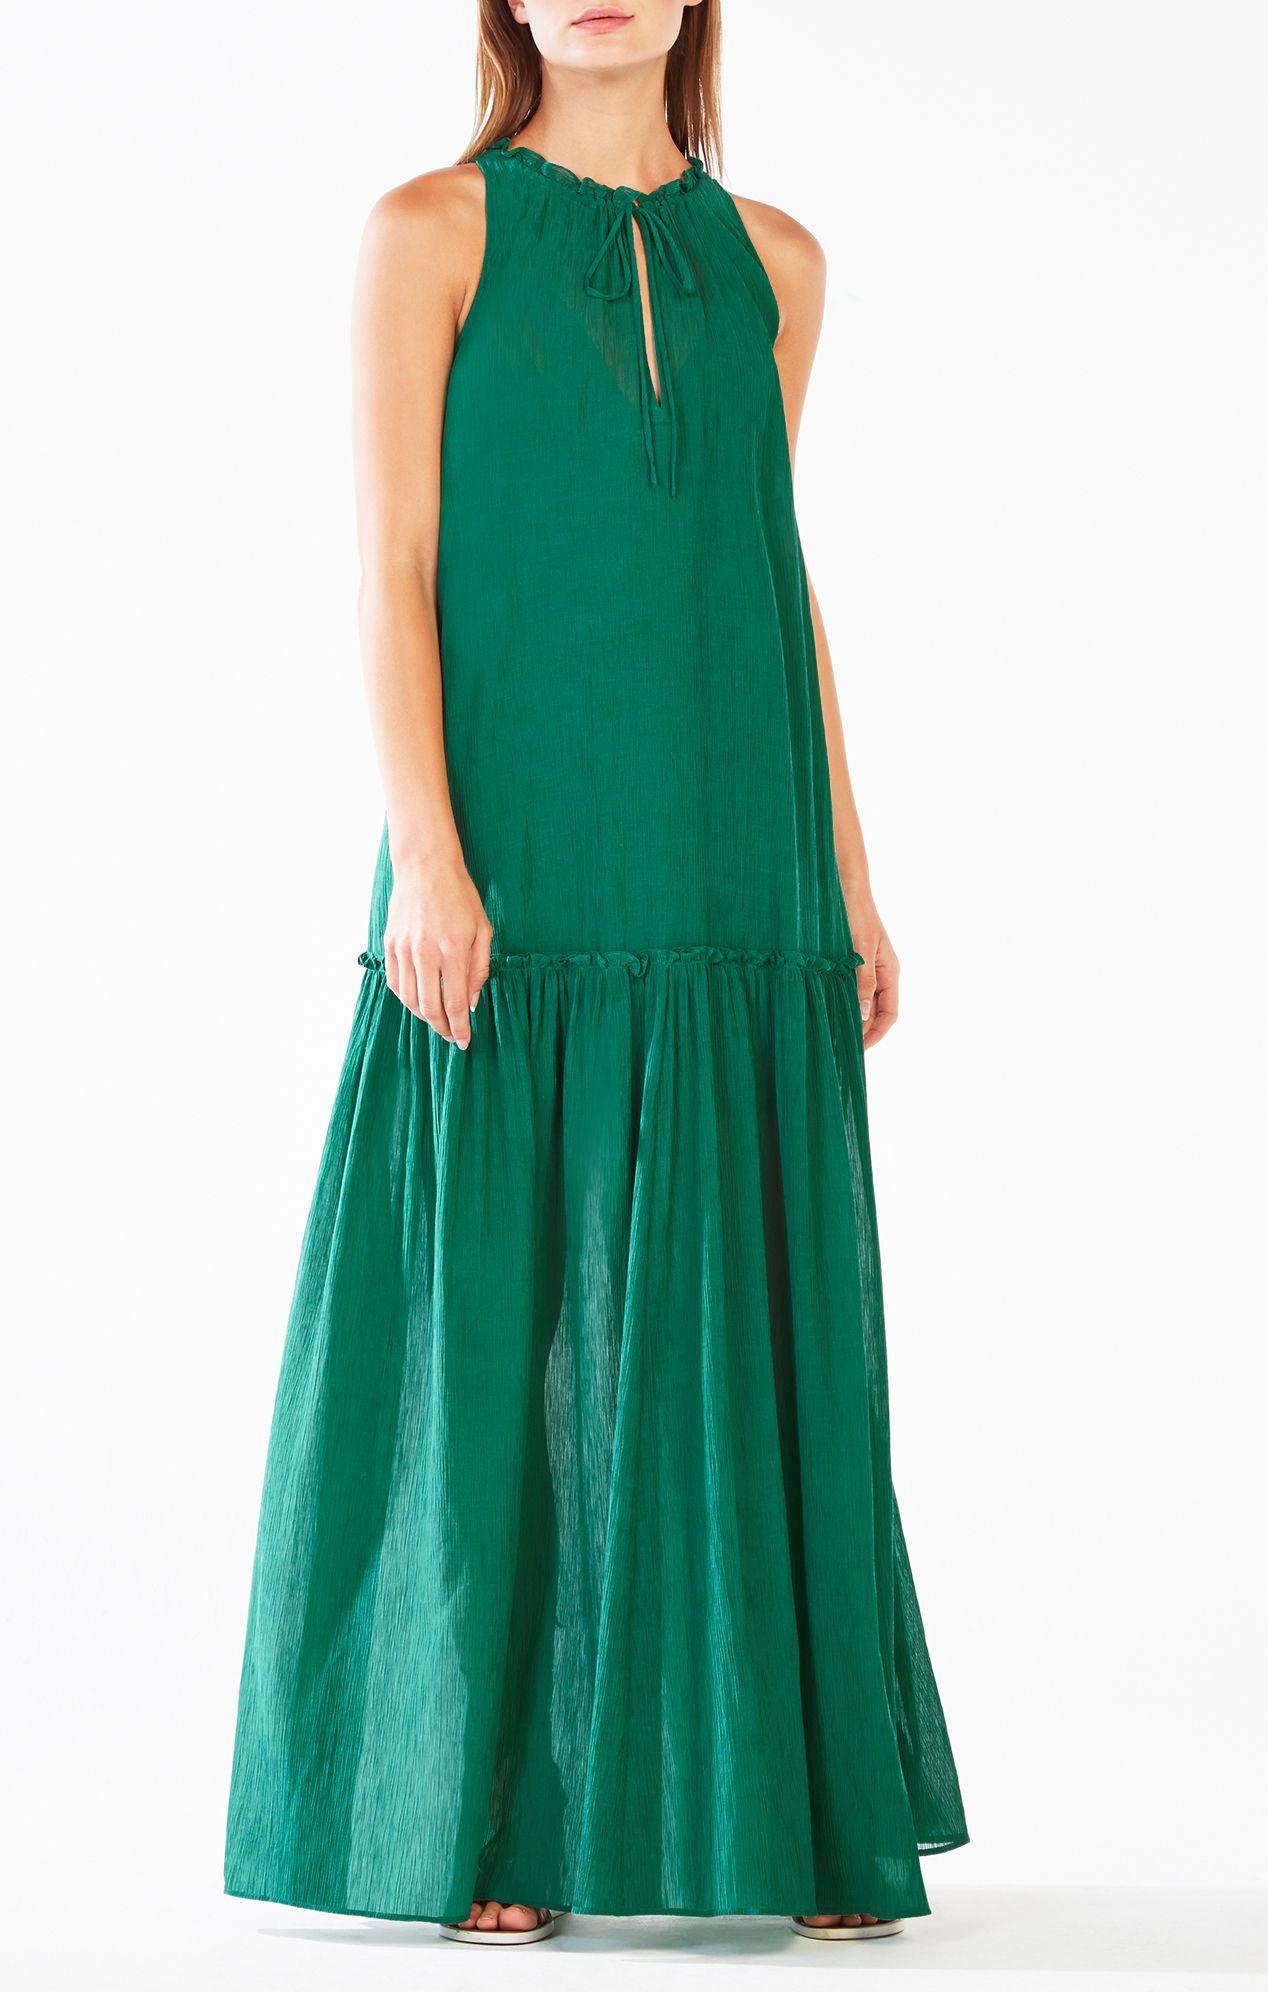 Galiana Drop Waist Maxi Dress Maxi Dress Dresses Anthropologie Evening Dress [ 1992 x 1268 Pixel ]